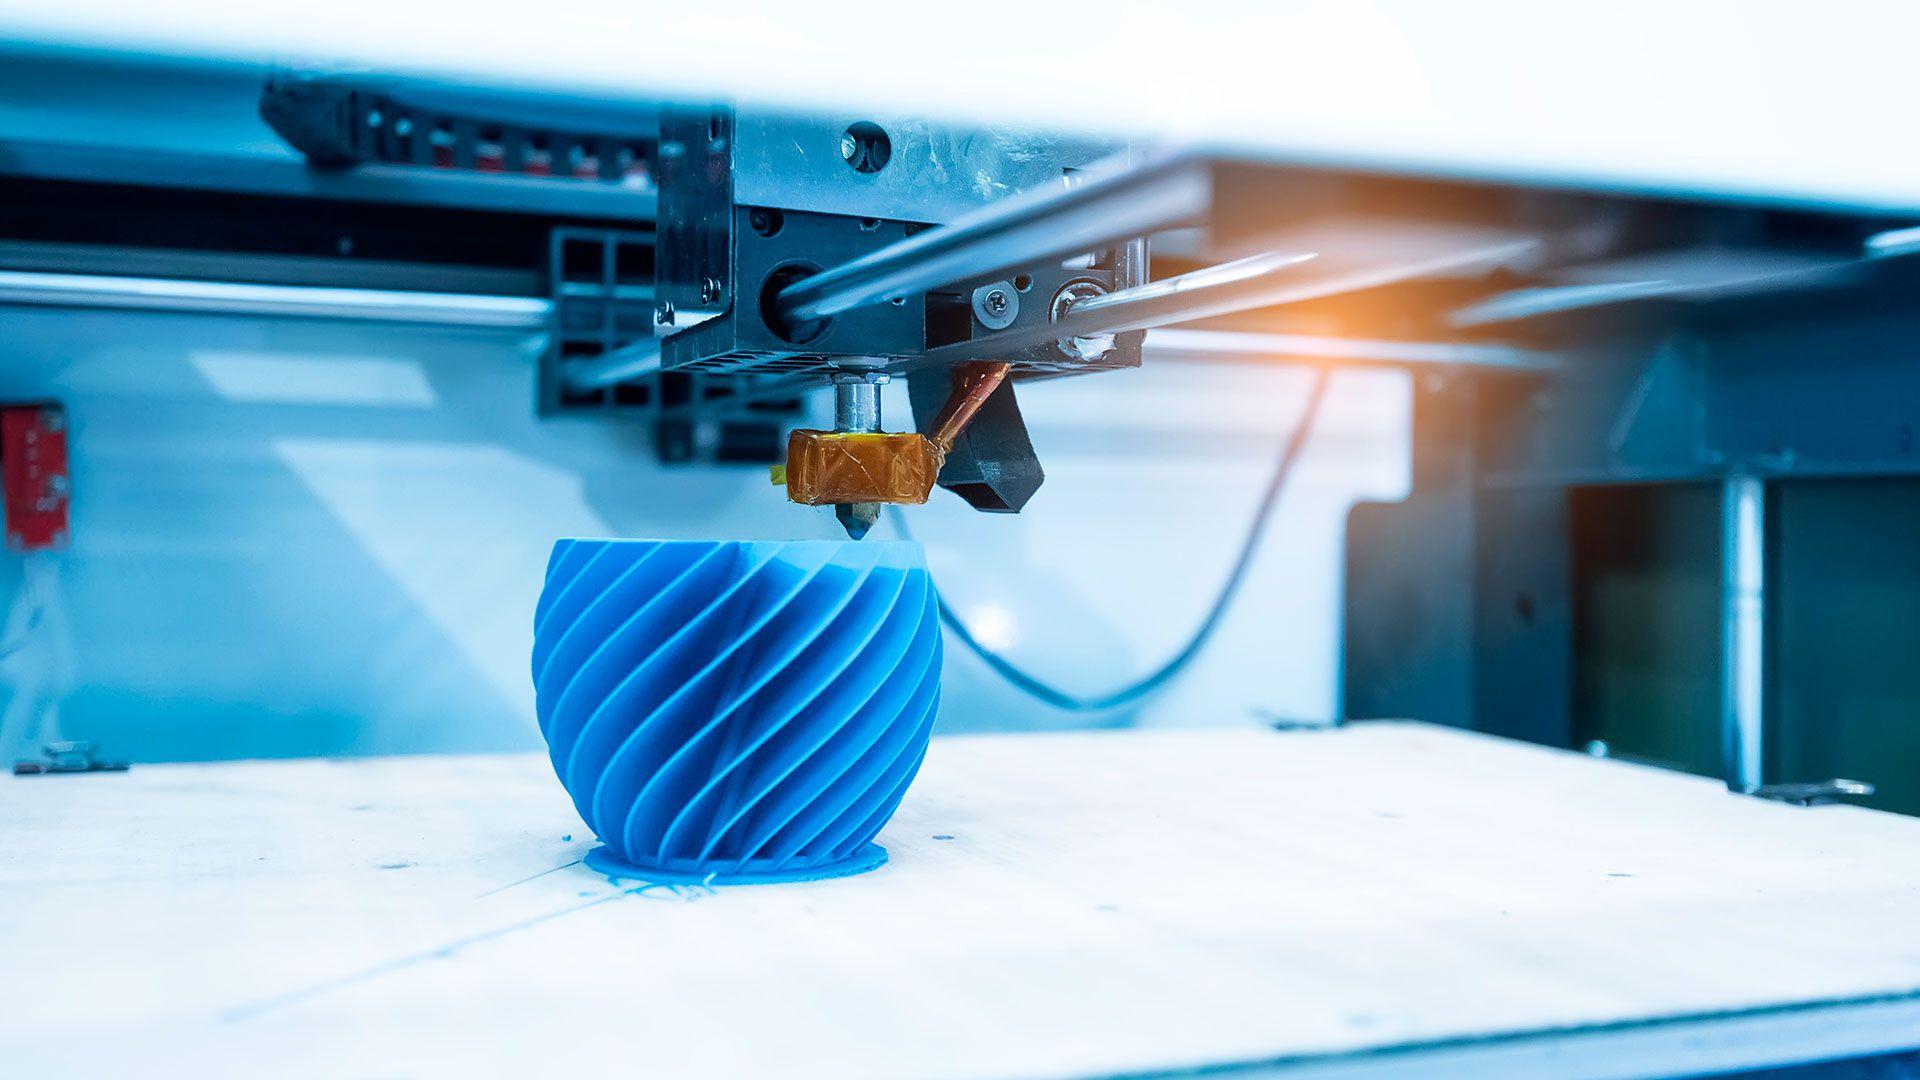 Impresora 3D, electrodoméstico del futuro (Shutterstock)